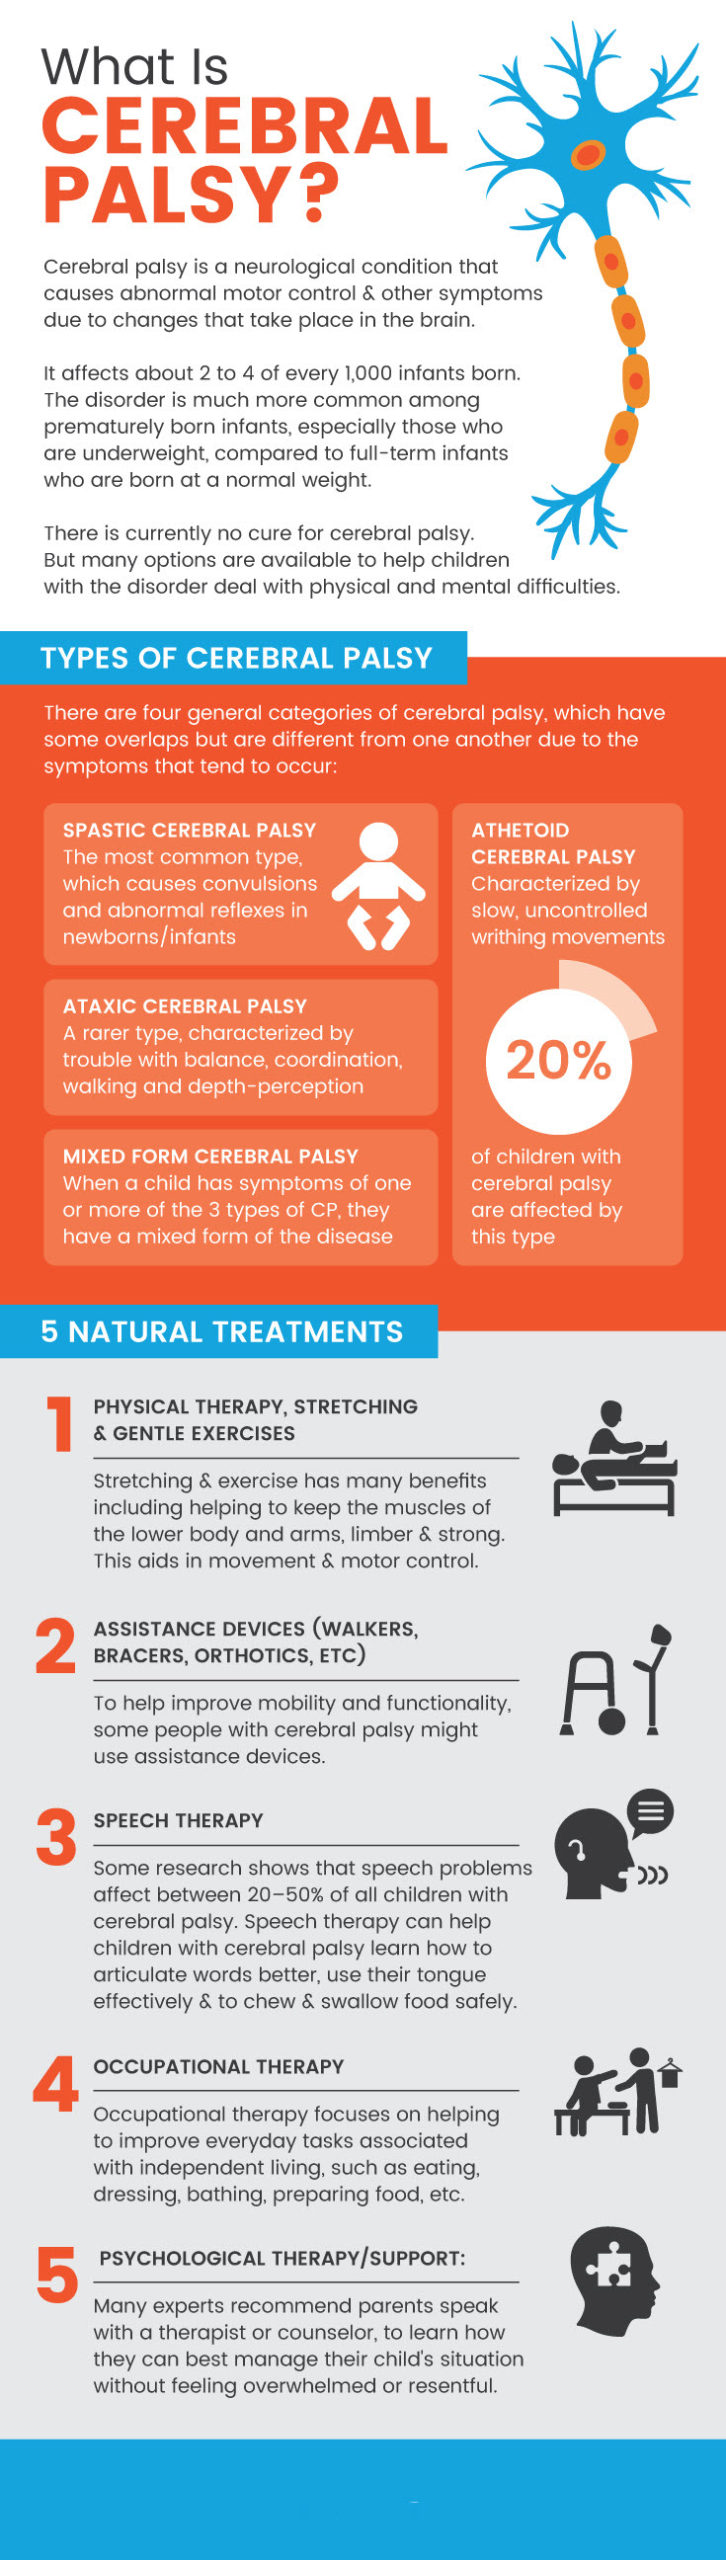 Cerebral palsy types & treatment - MKexpress.net